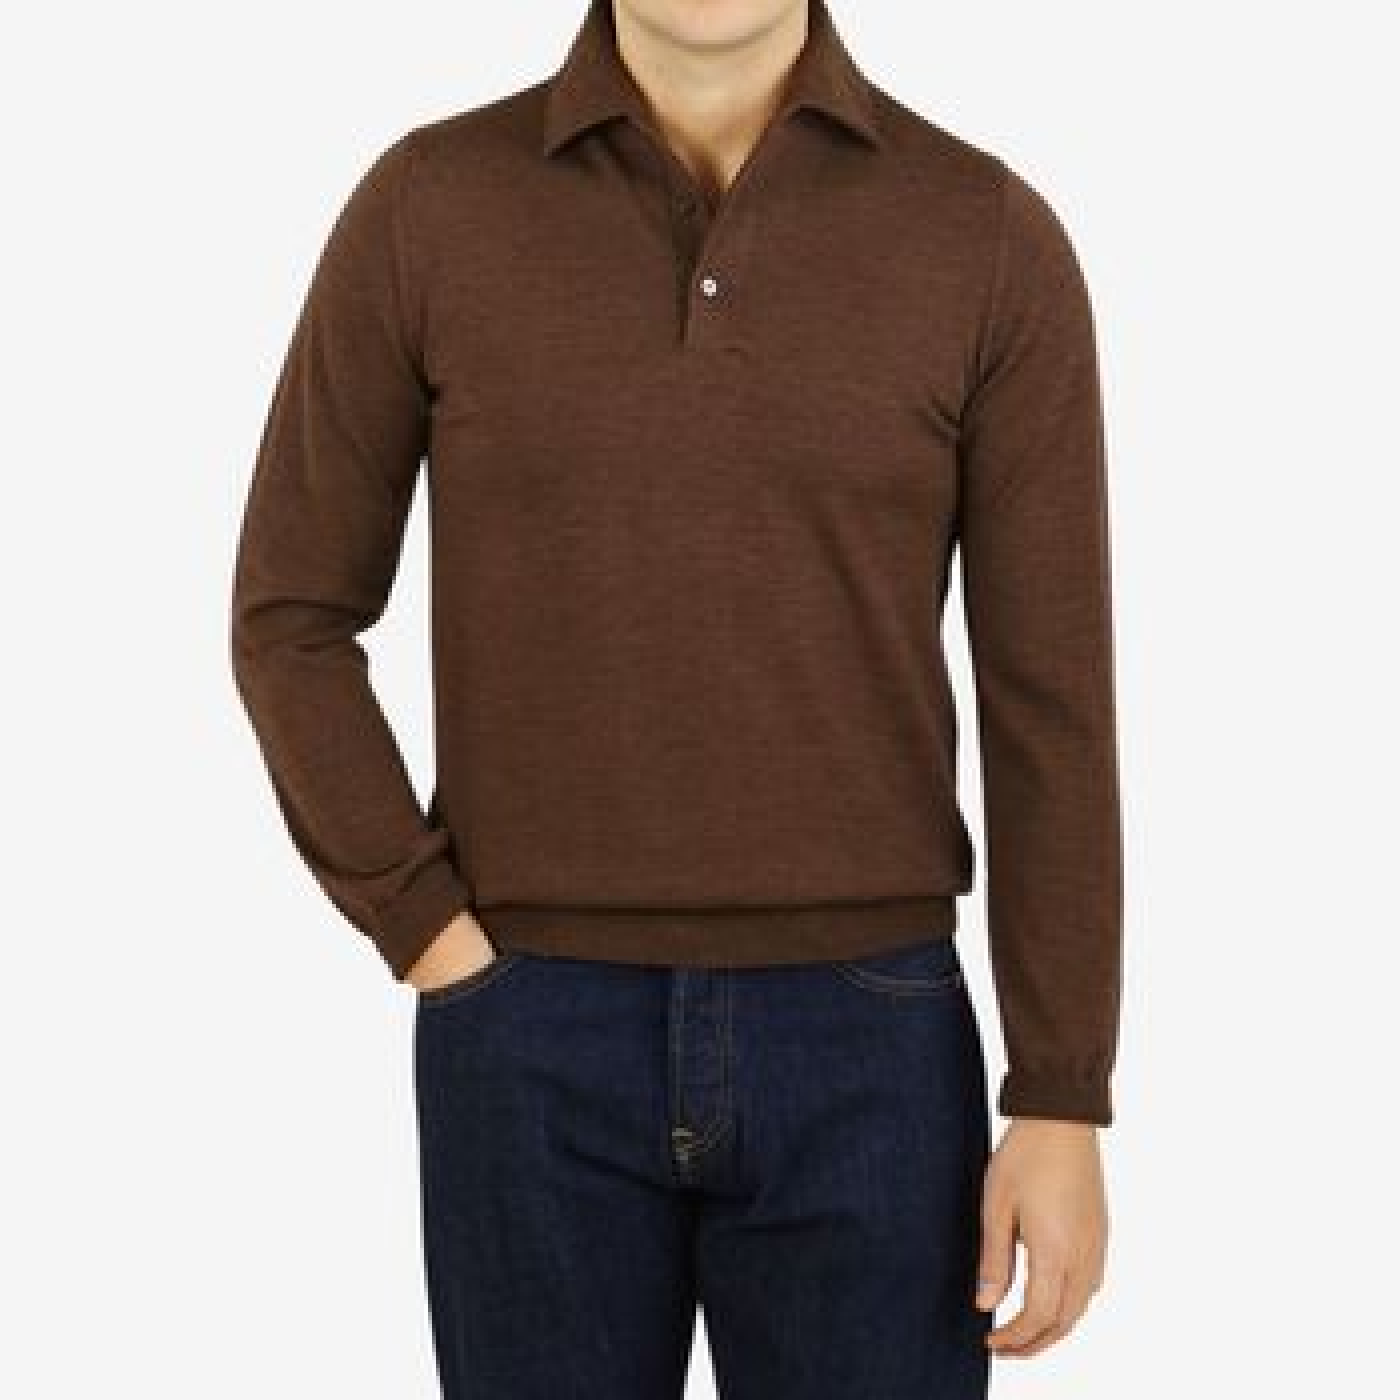 Stenströms Brown Zegna Baruffa Merino Wool Polo Shirt Front.png1